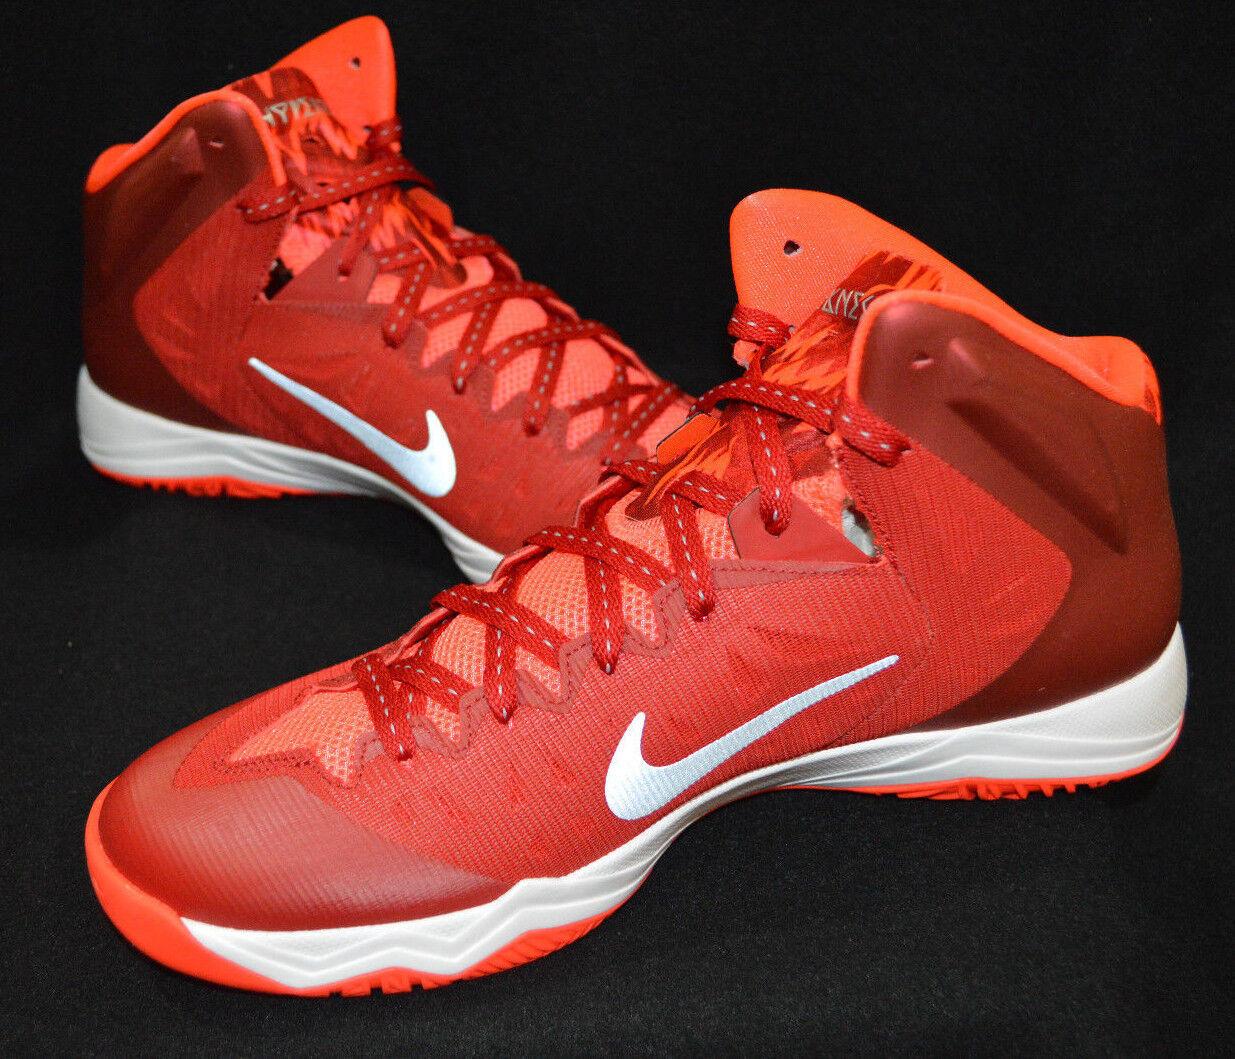 Nike Zoom Hyperquickness Hyperquickness Hyperquickness Grfx Uomini   Da Basket Varie Dimensioni 5220c7